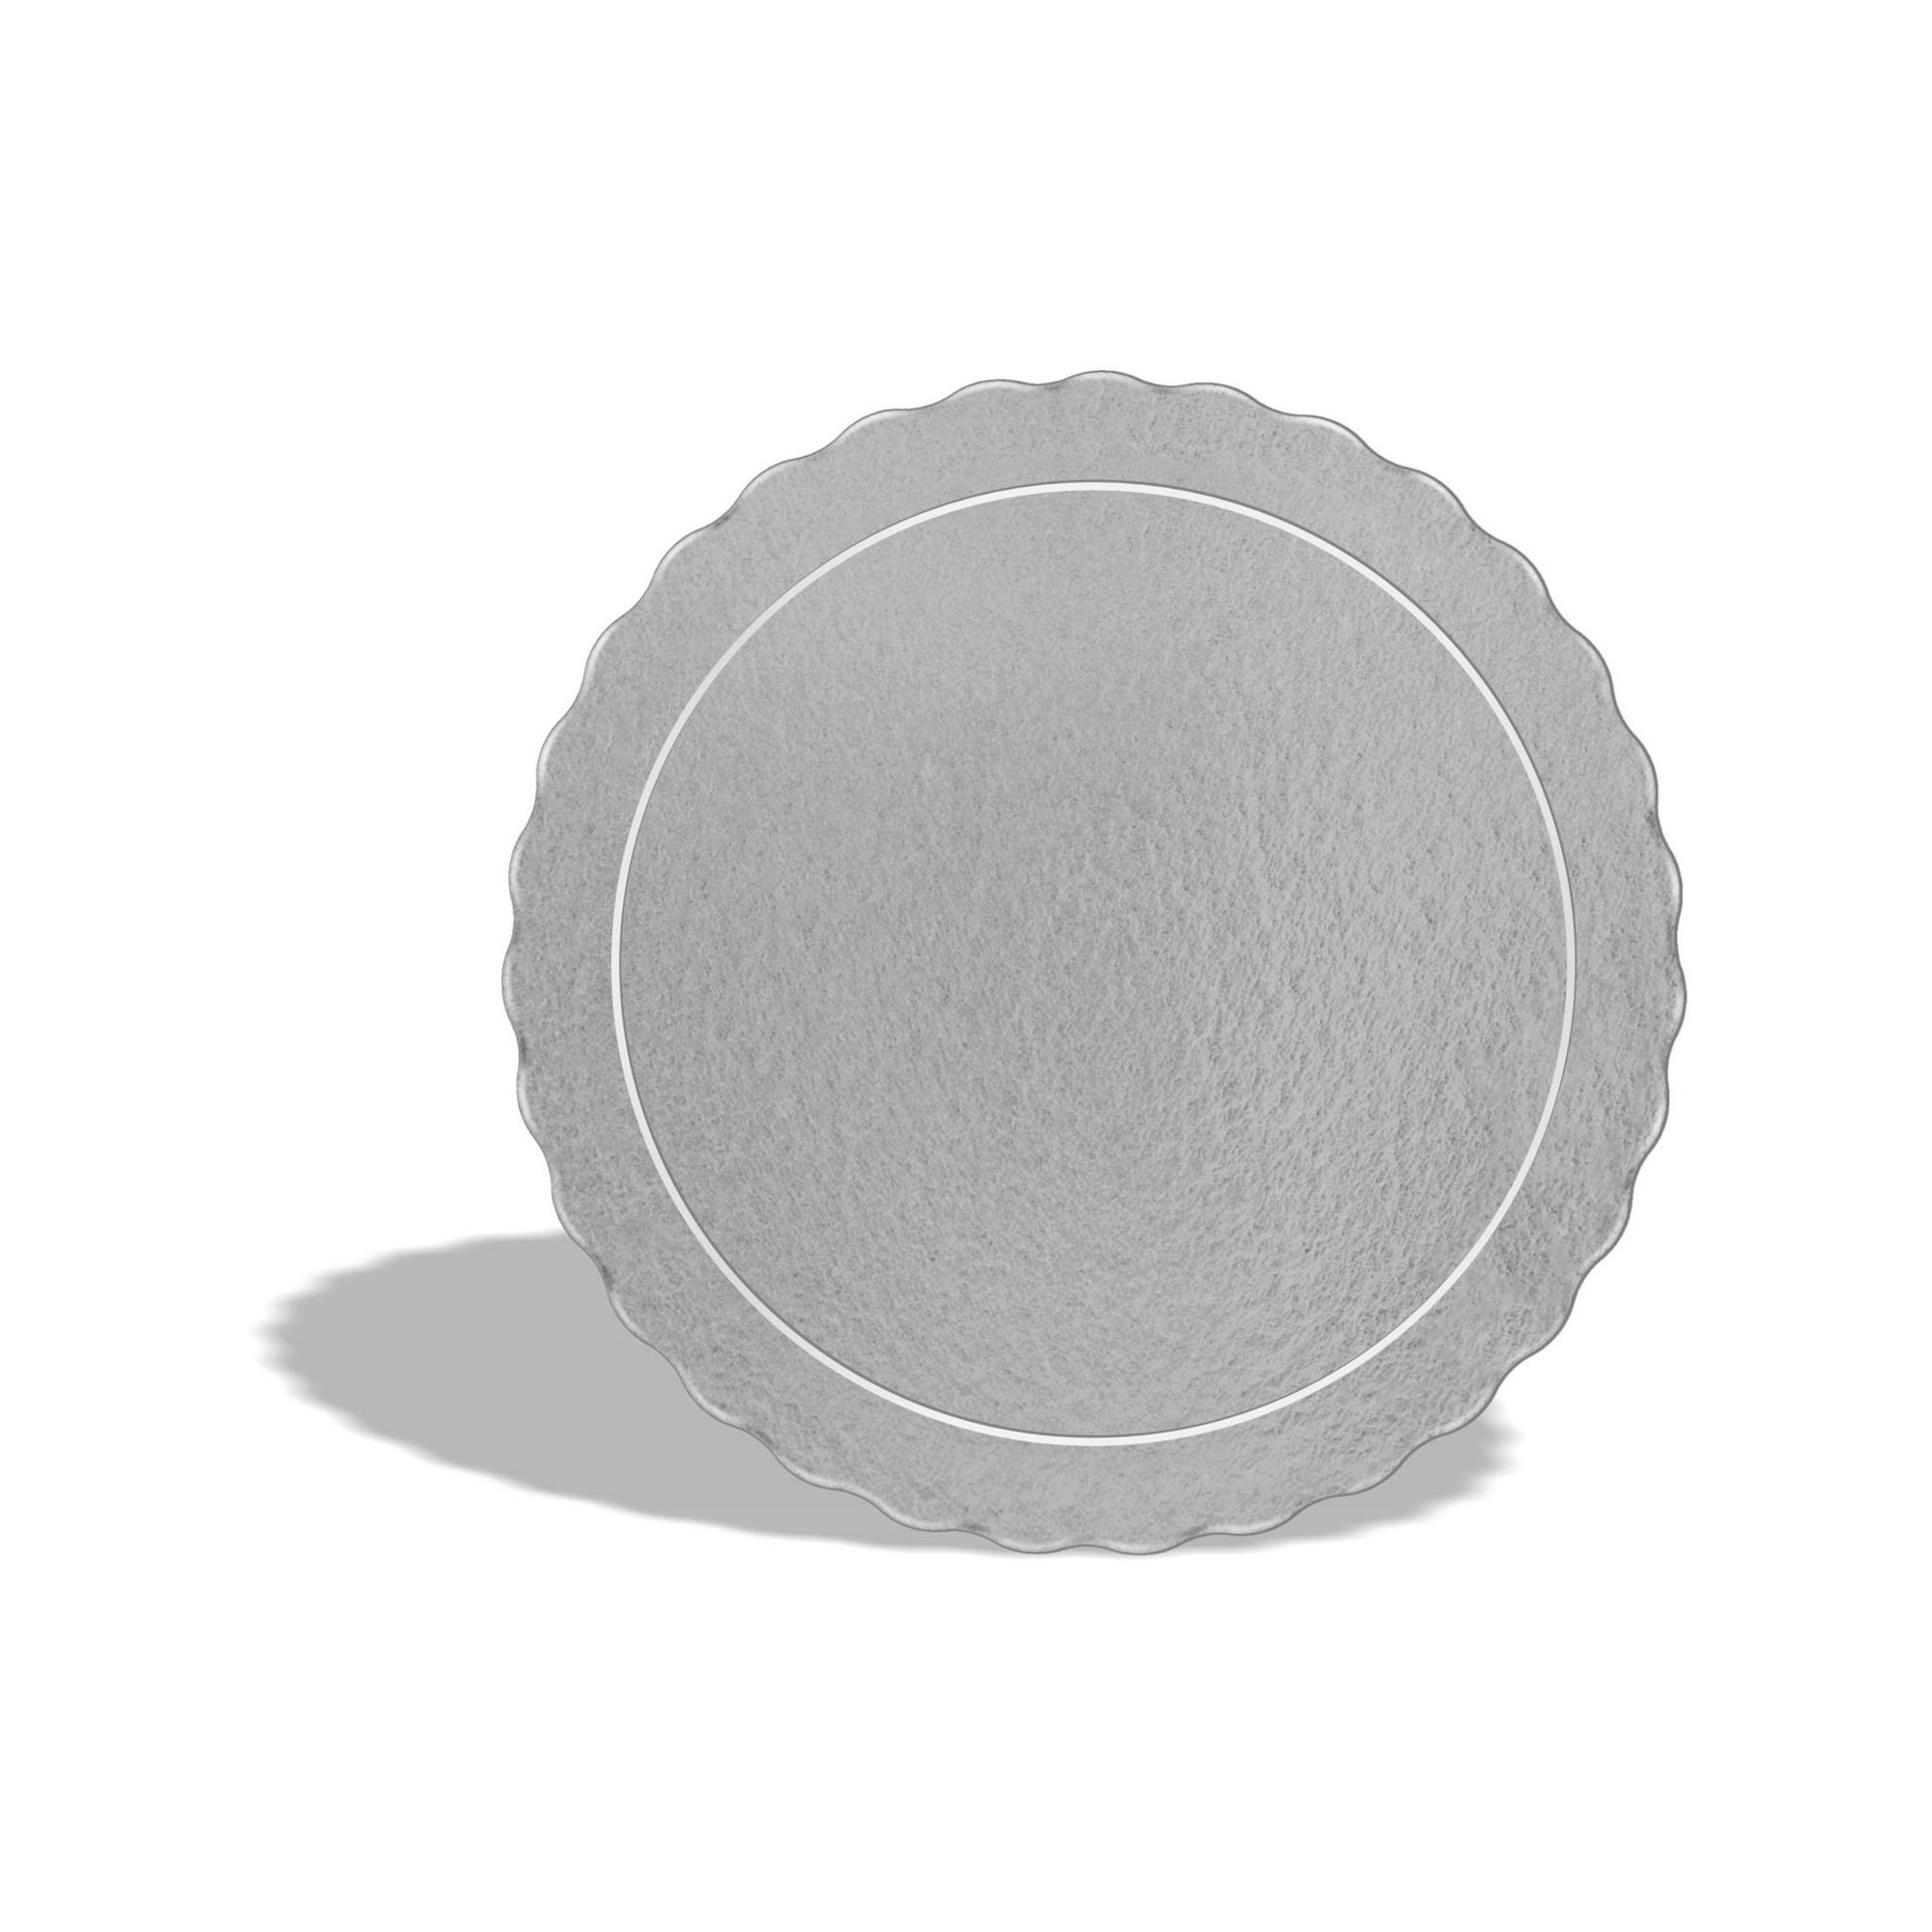 50 Bases Laminadas, Suporte P/ Bolo, Cake Board, 28cm - Prata